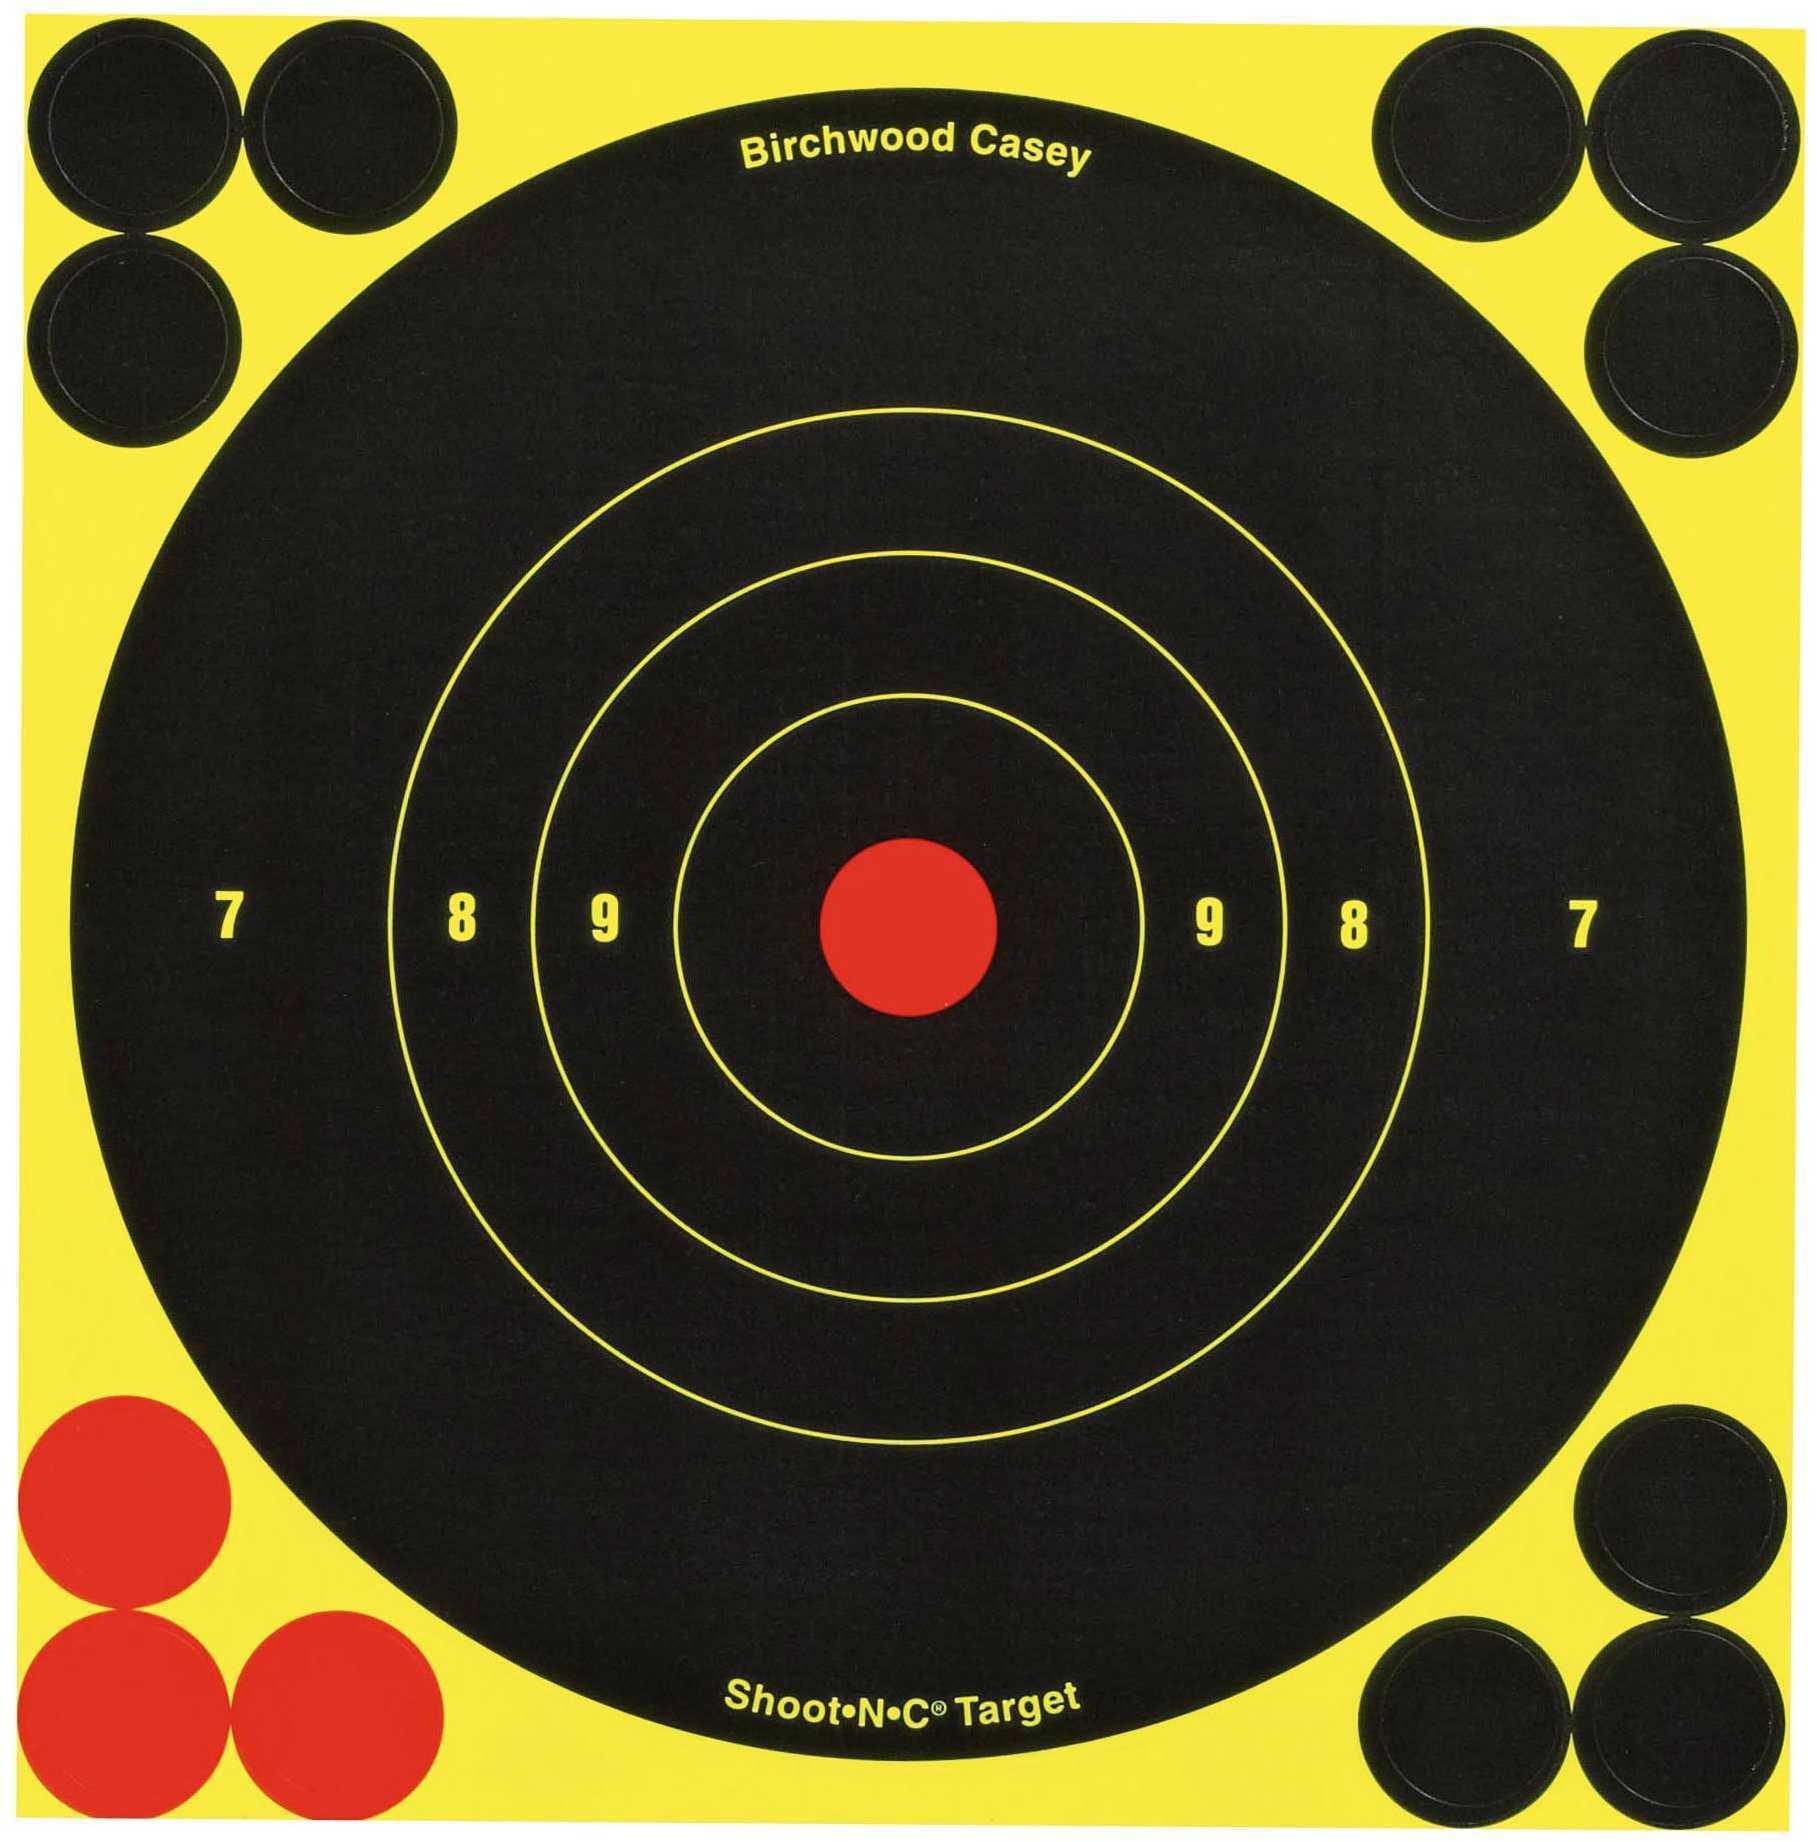 "Birchwood Casey Shoot-N-C Targets: Bull's-Eye 5.5"" Round Target Per 12 Md: 34512"